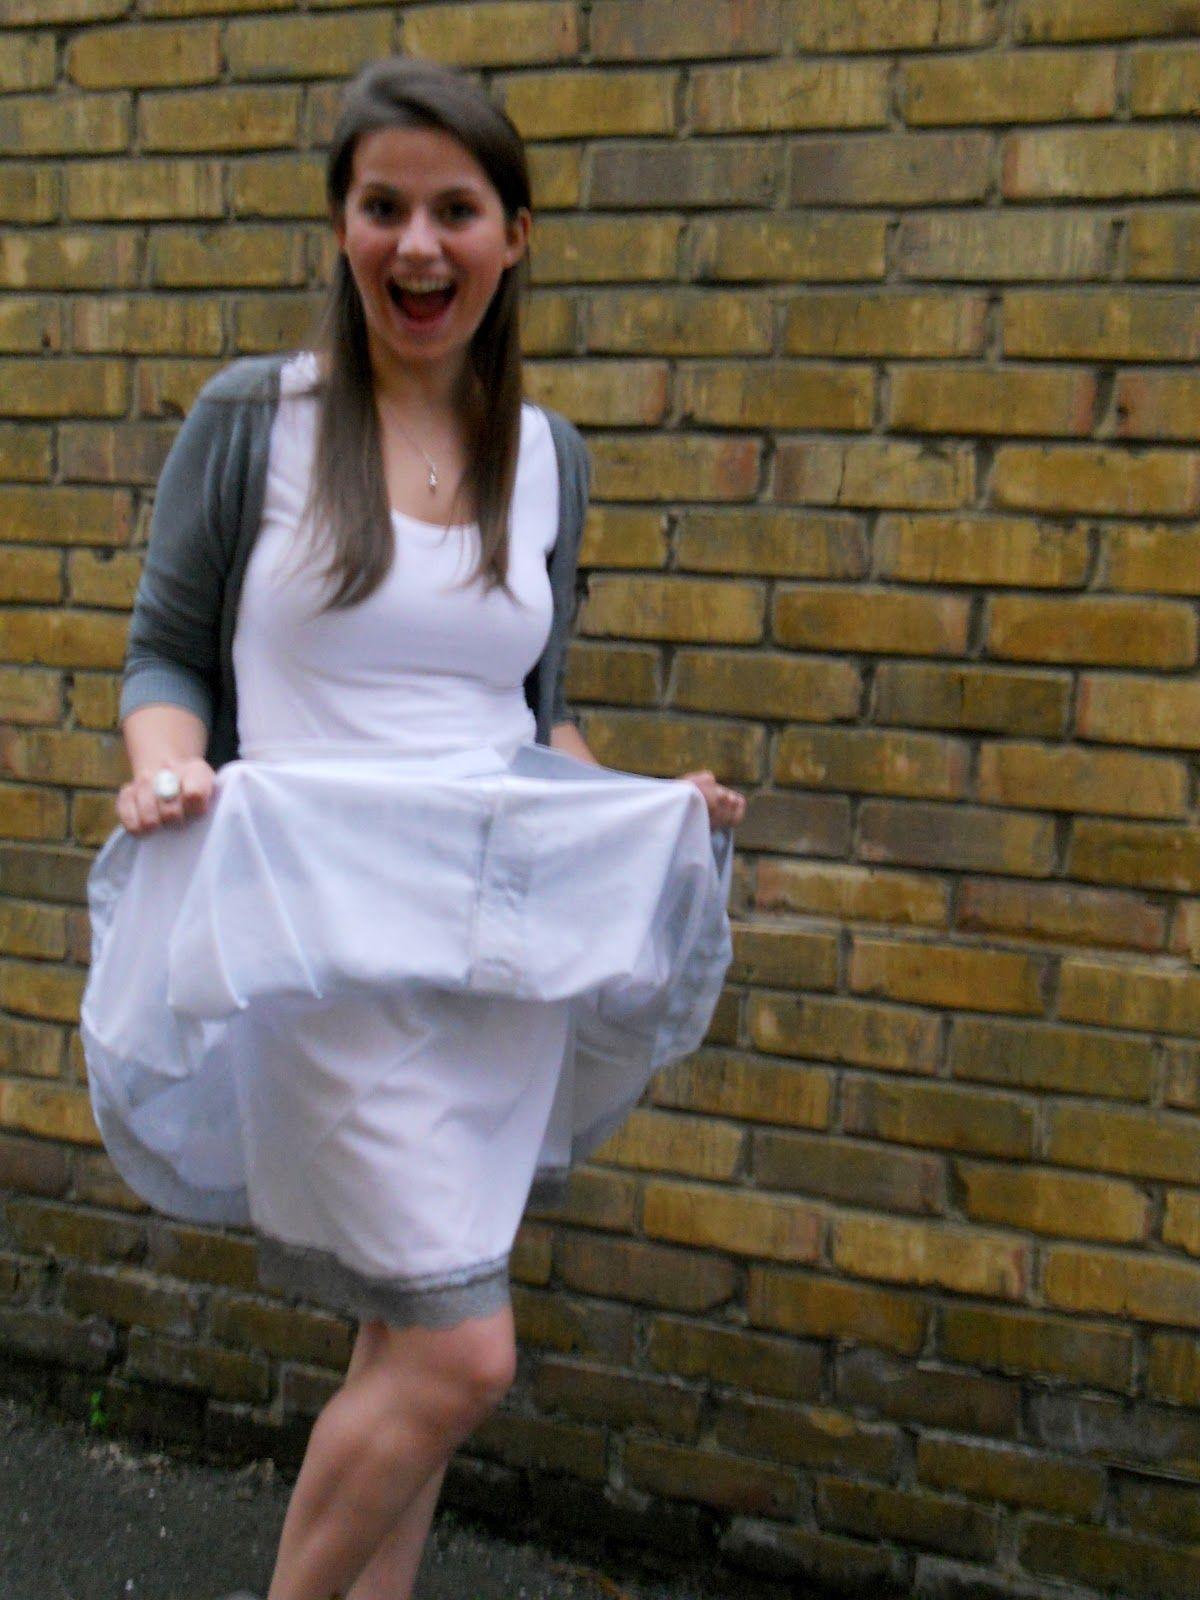 fancy dress upskirt